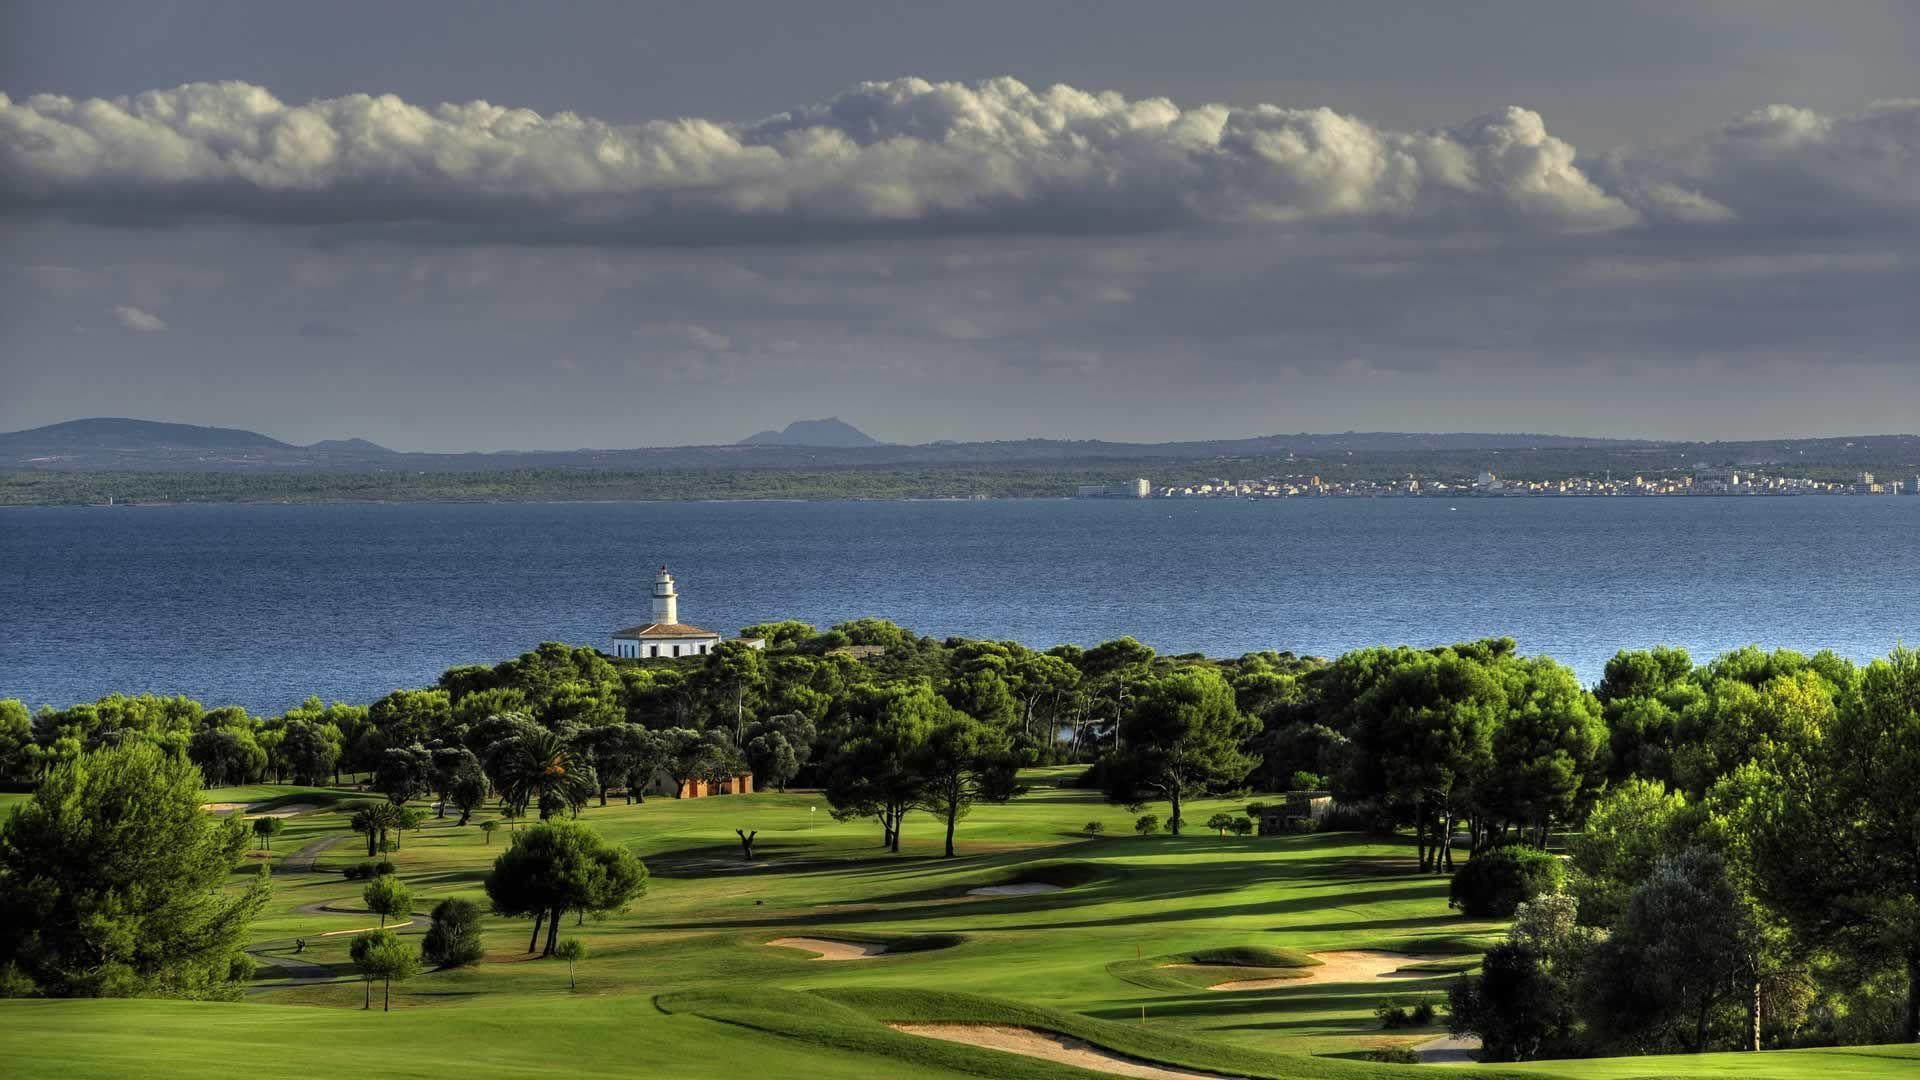 Golfplatz in Port d'Alcúdia